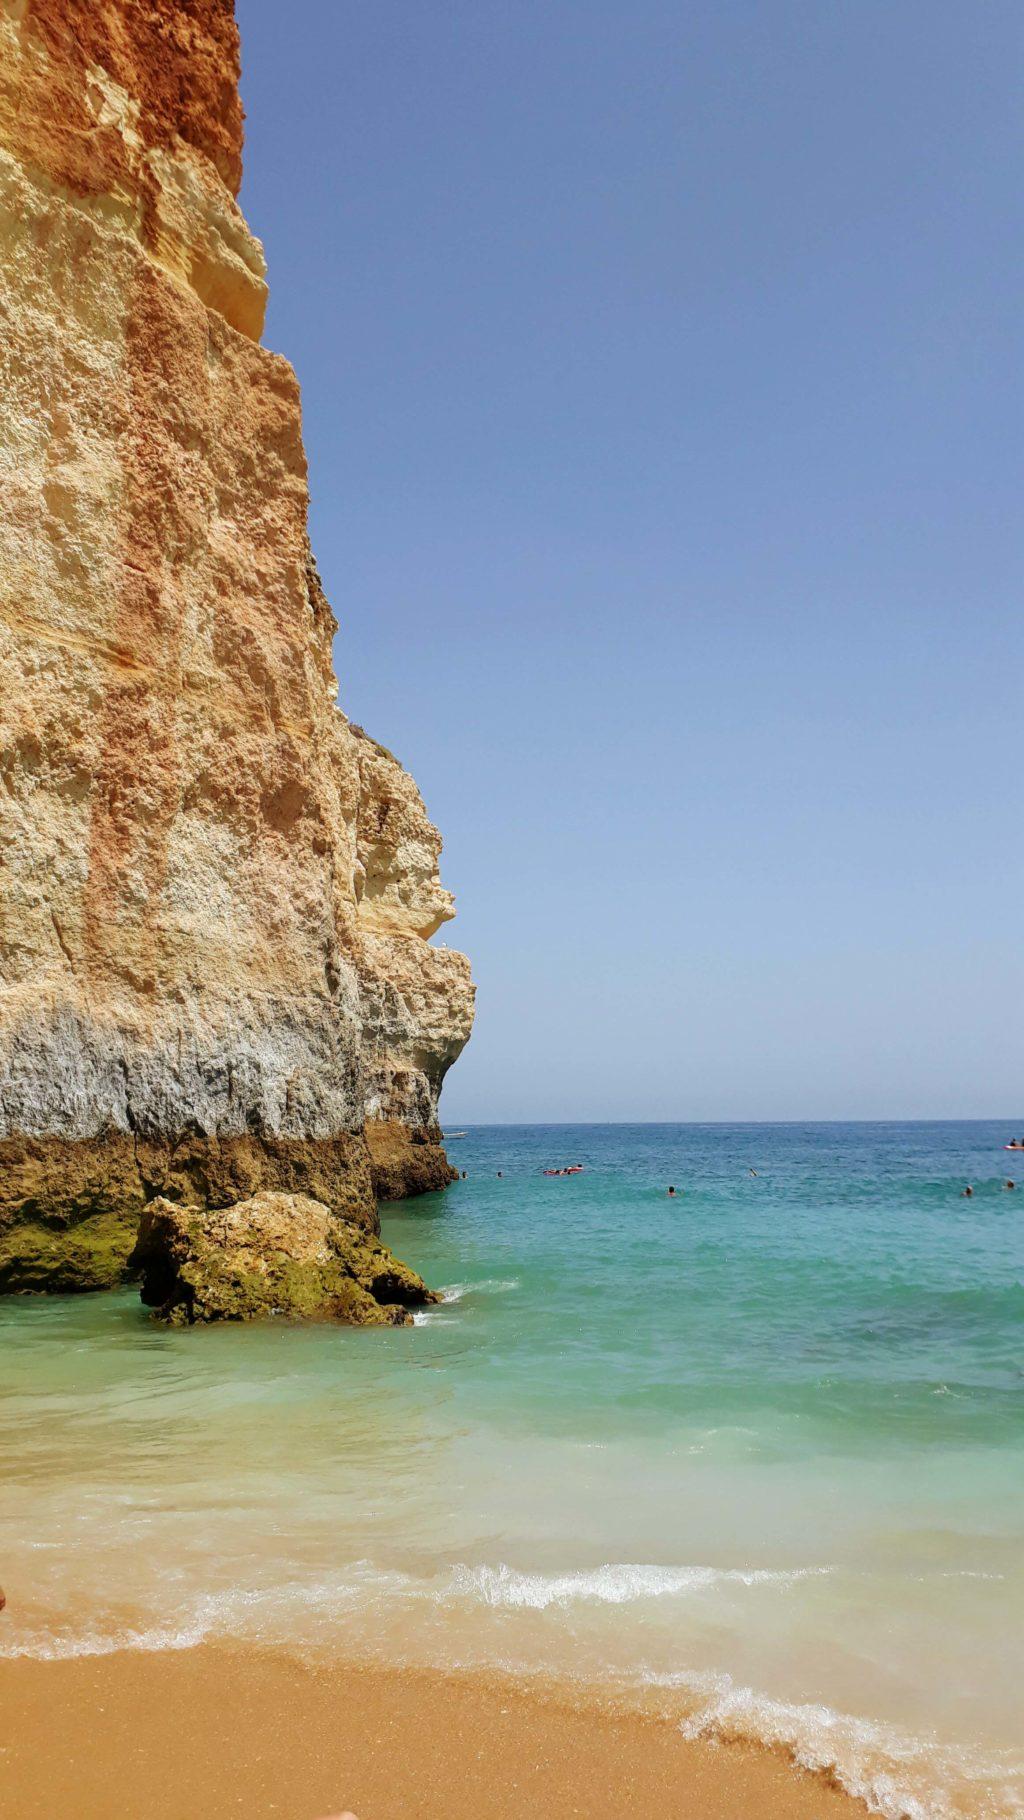 Das Highlight der Algarve: die Benagil-Höhle